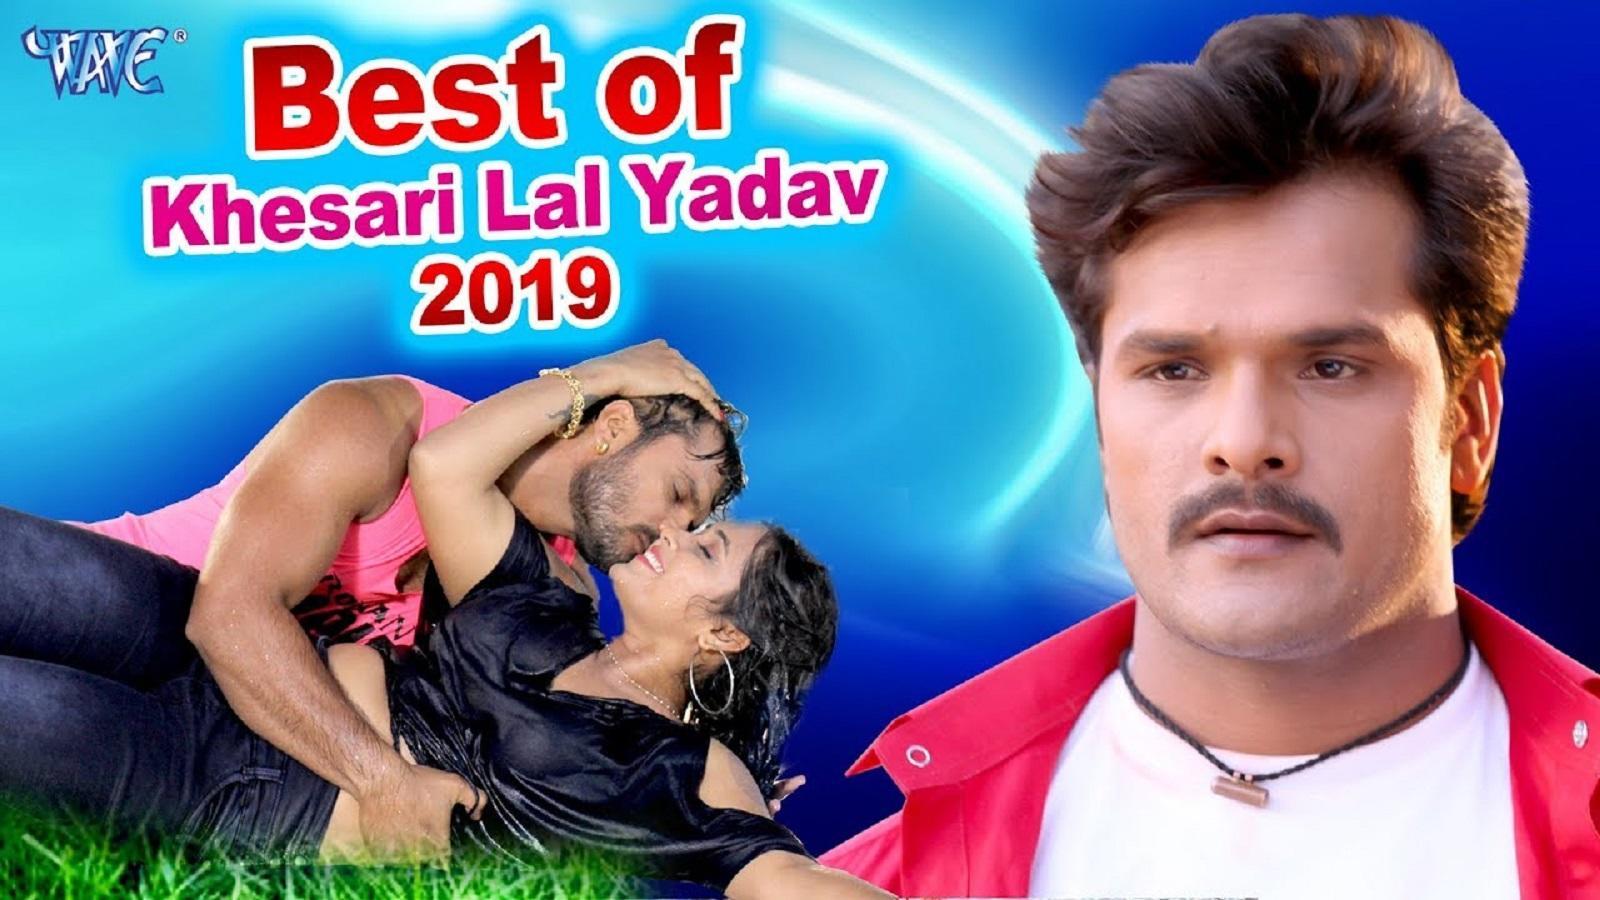 Bhojpuri Gana Video Songs 2019: Khesari Lal Yadav and Kajal Raghwani  Bhojpuri Songs Video Jukebox